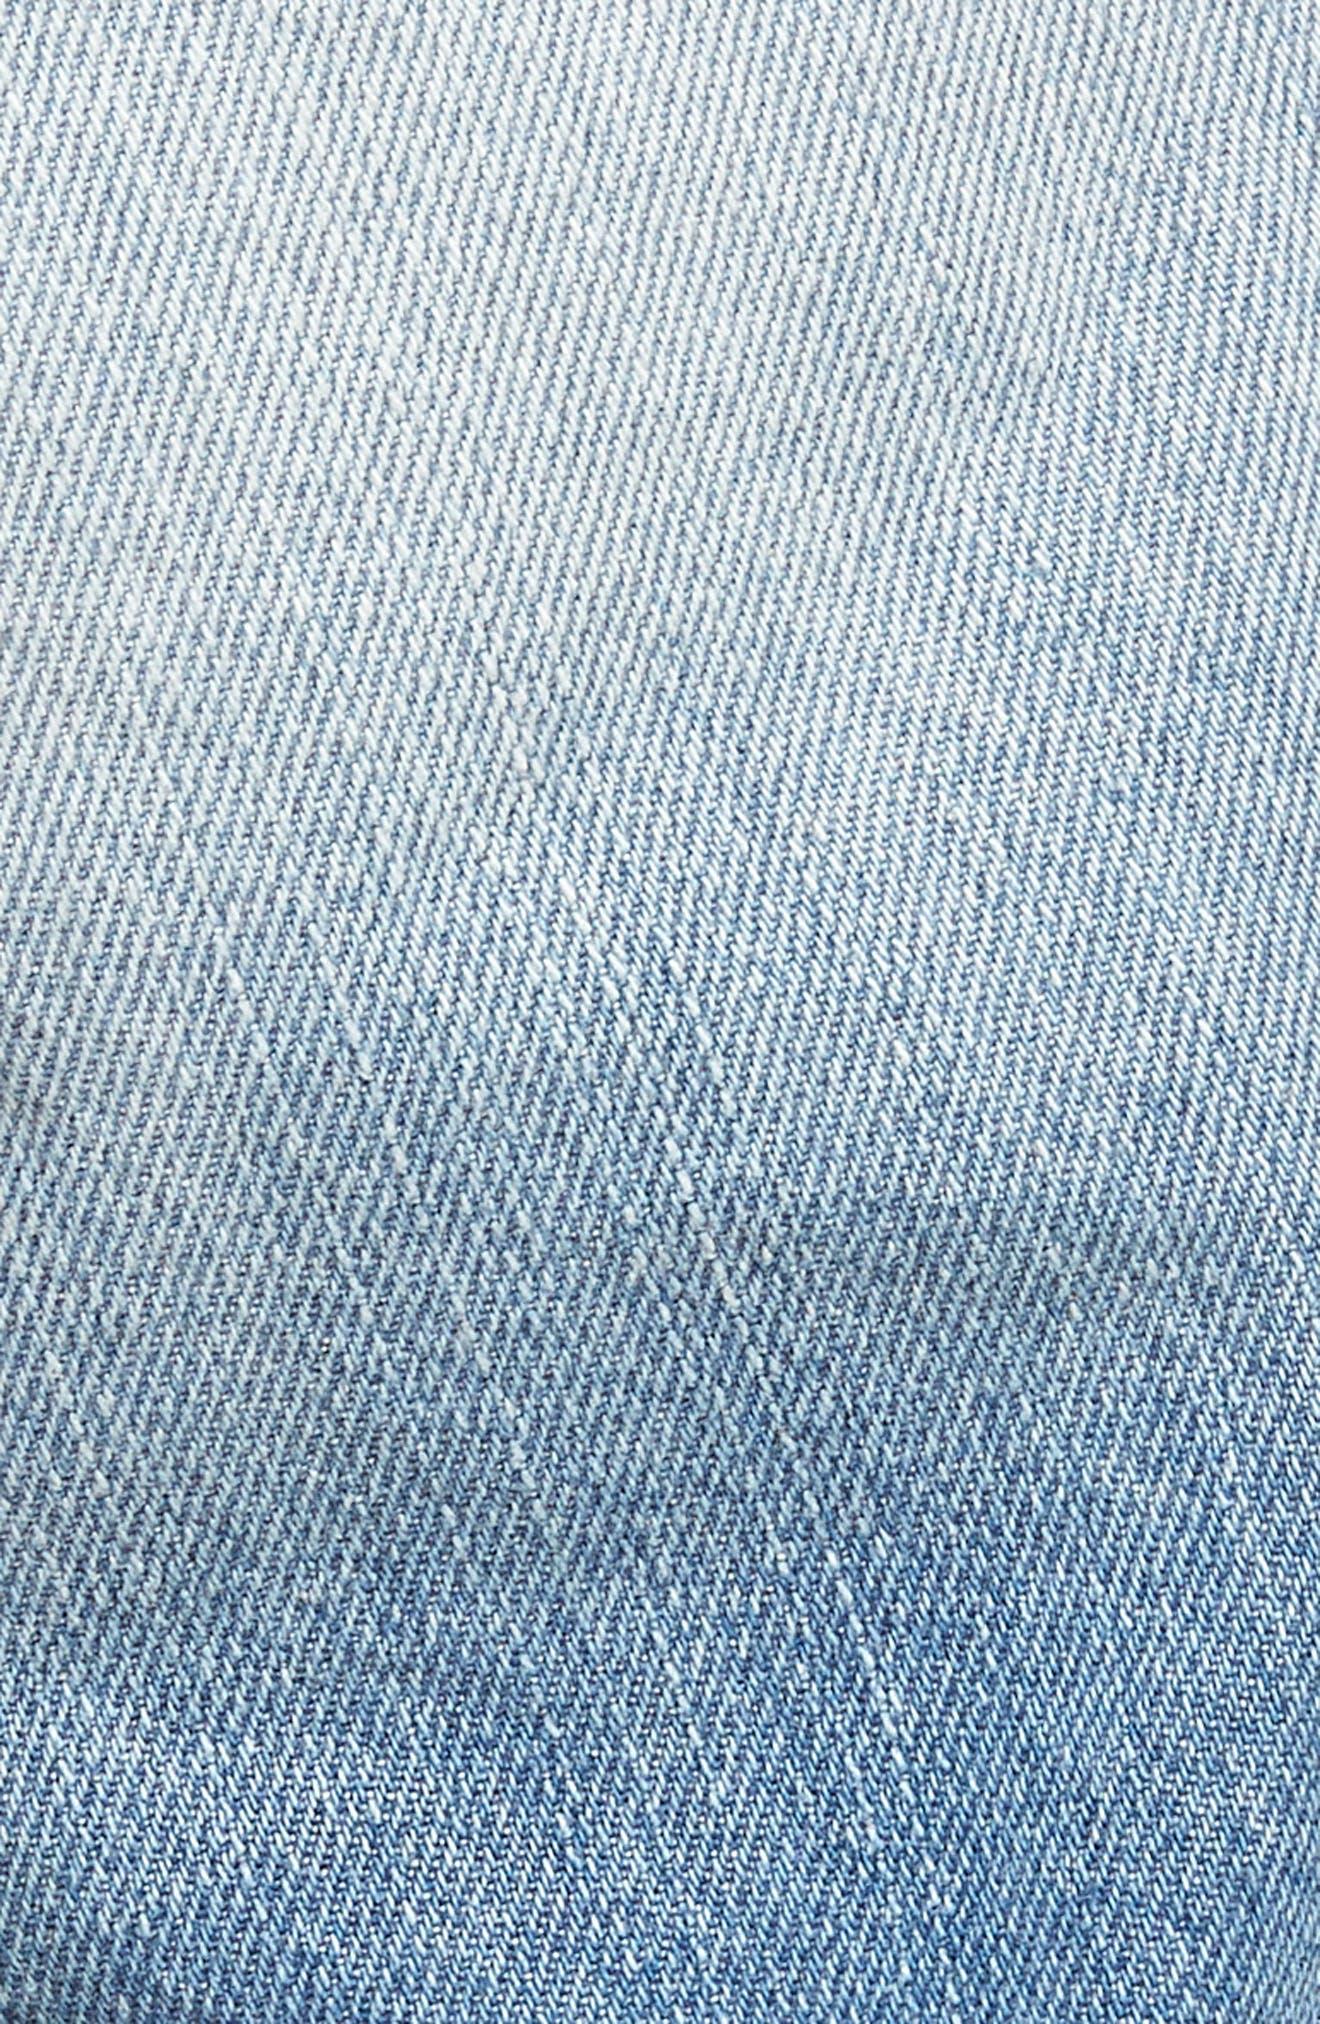 Slim Fit Denim Shorts,                             Alternate thumbnail 4, color,                             Light Aged